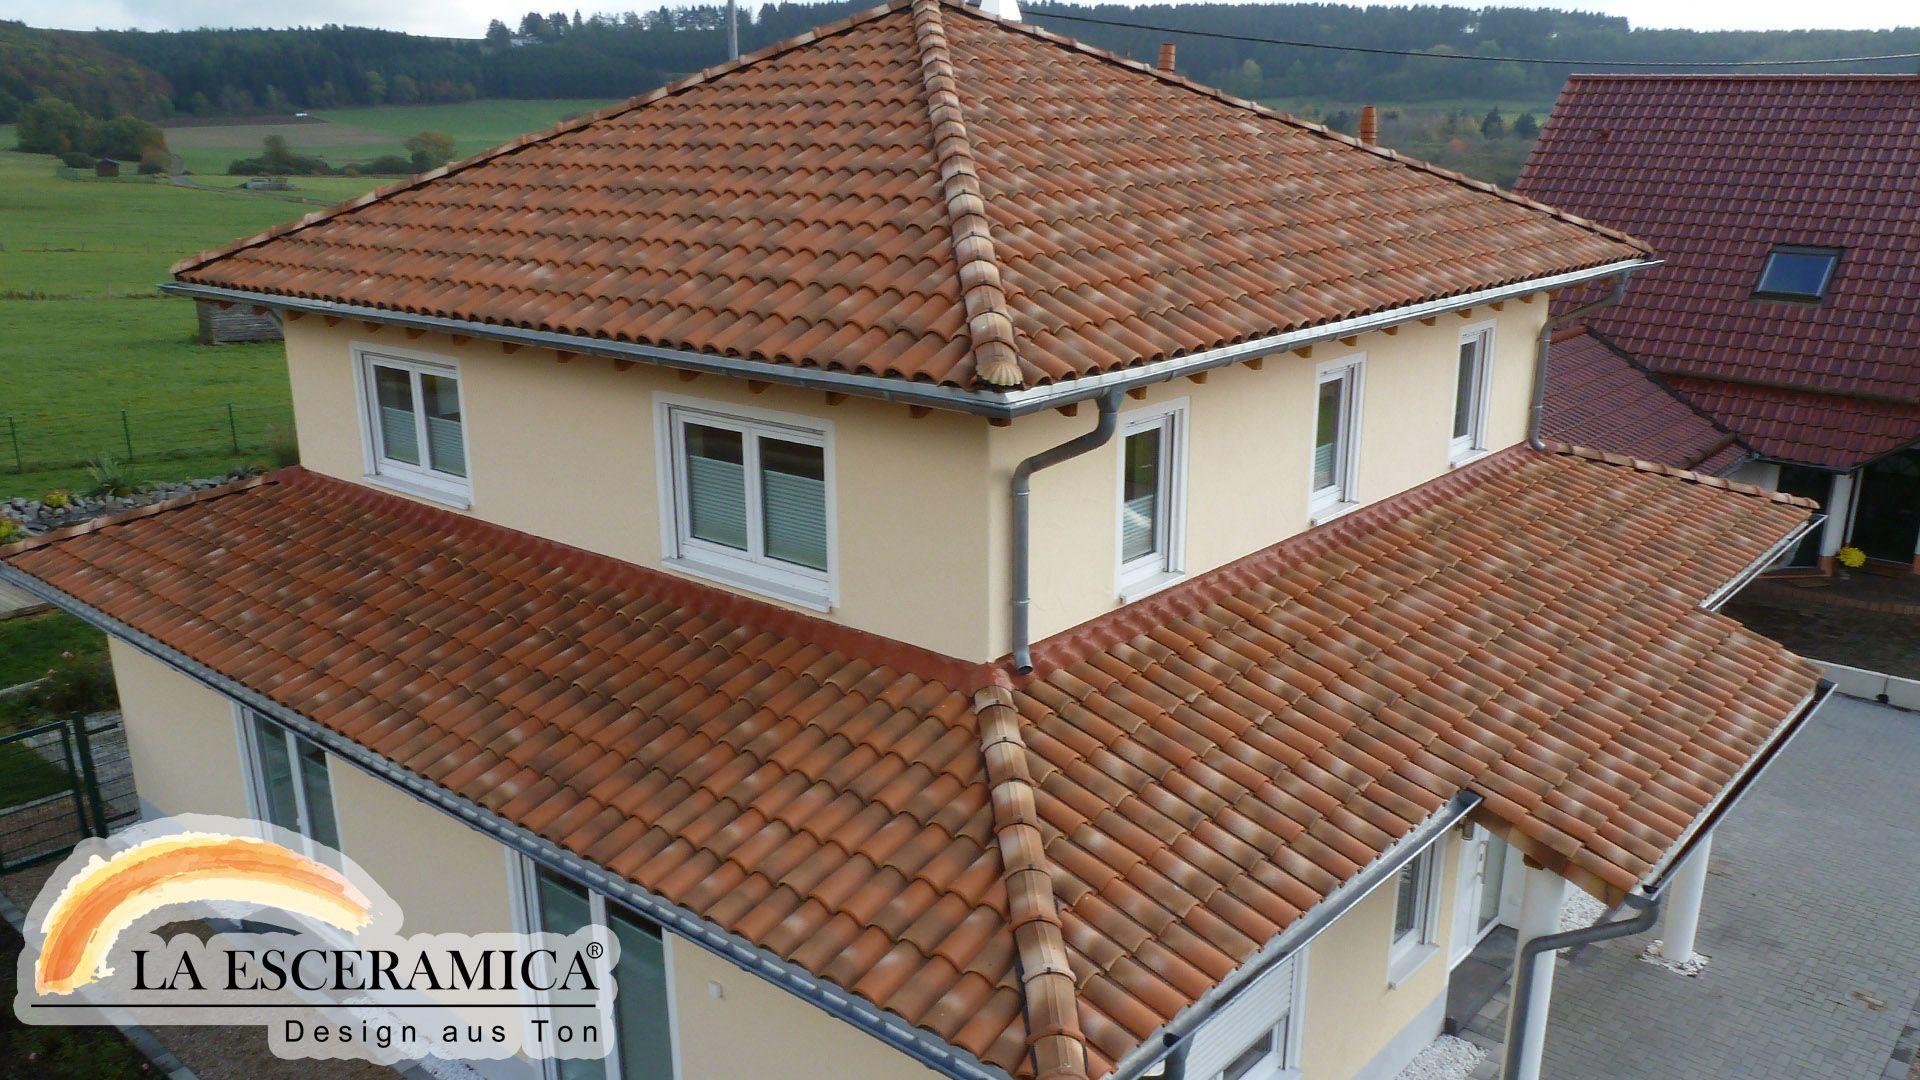 Dachziegel farben  La Esceramica Dachziegel Farbe Toskana | Dachziegel | Pinterest ...